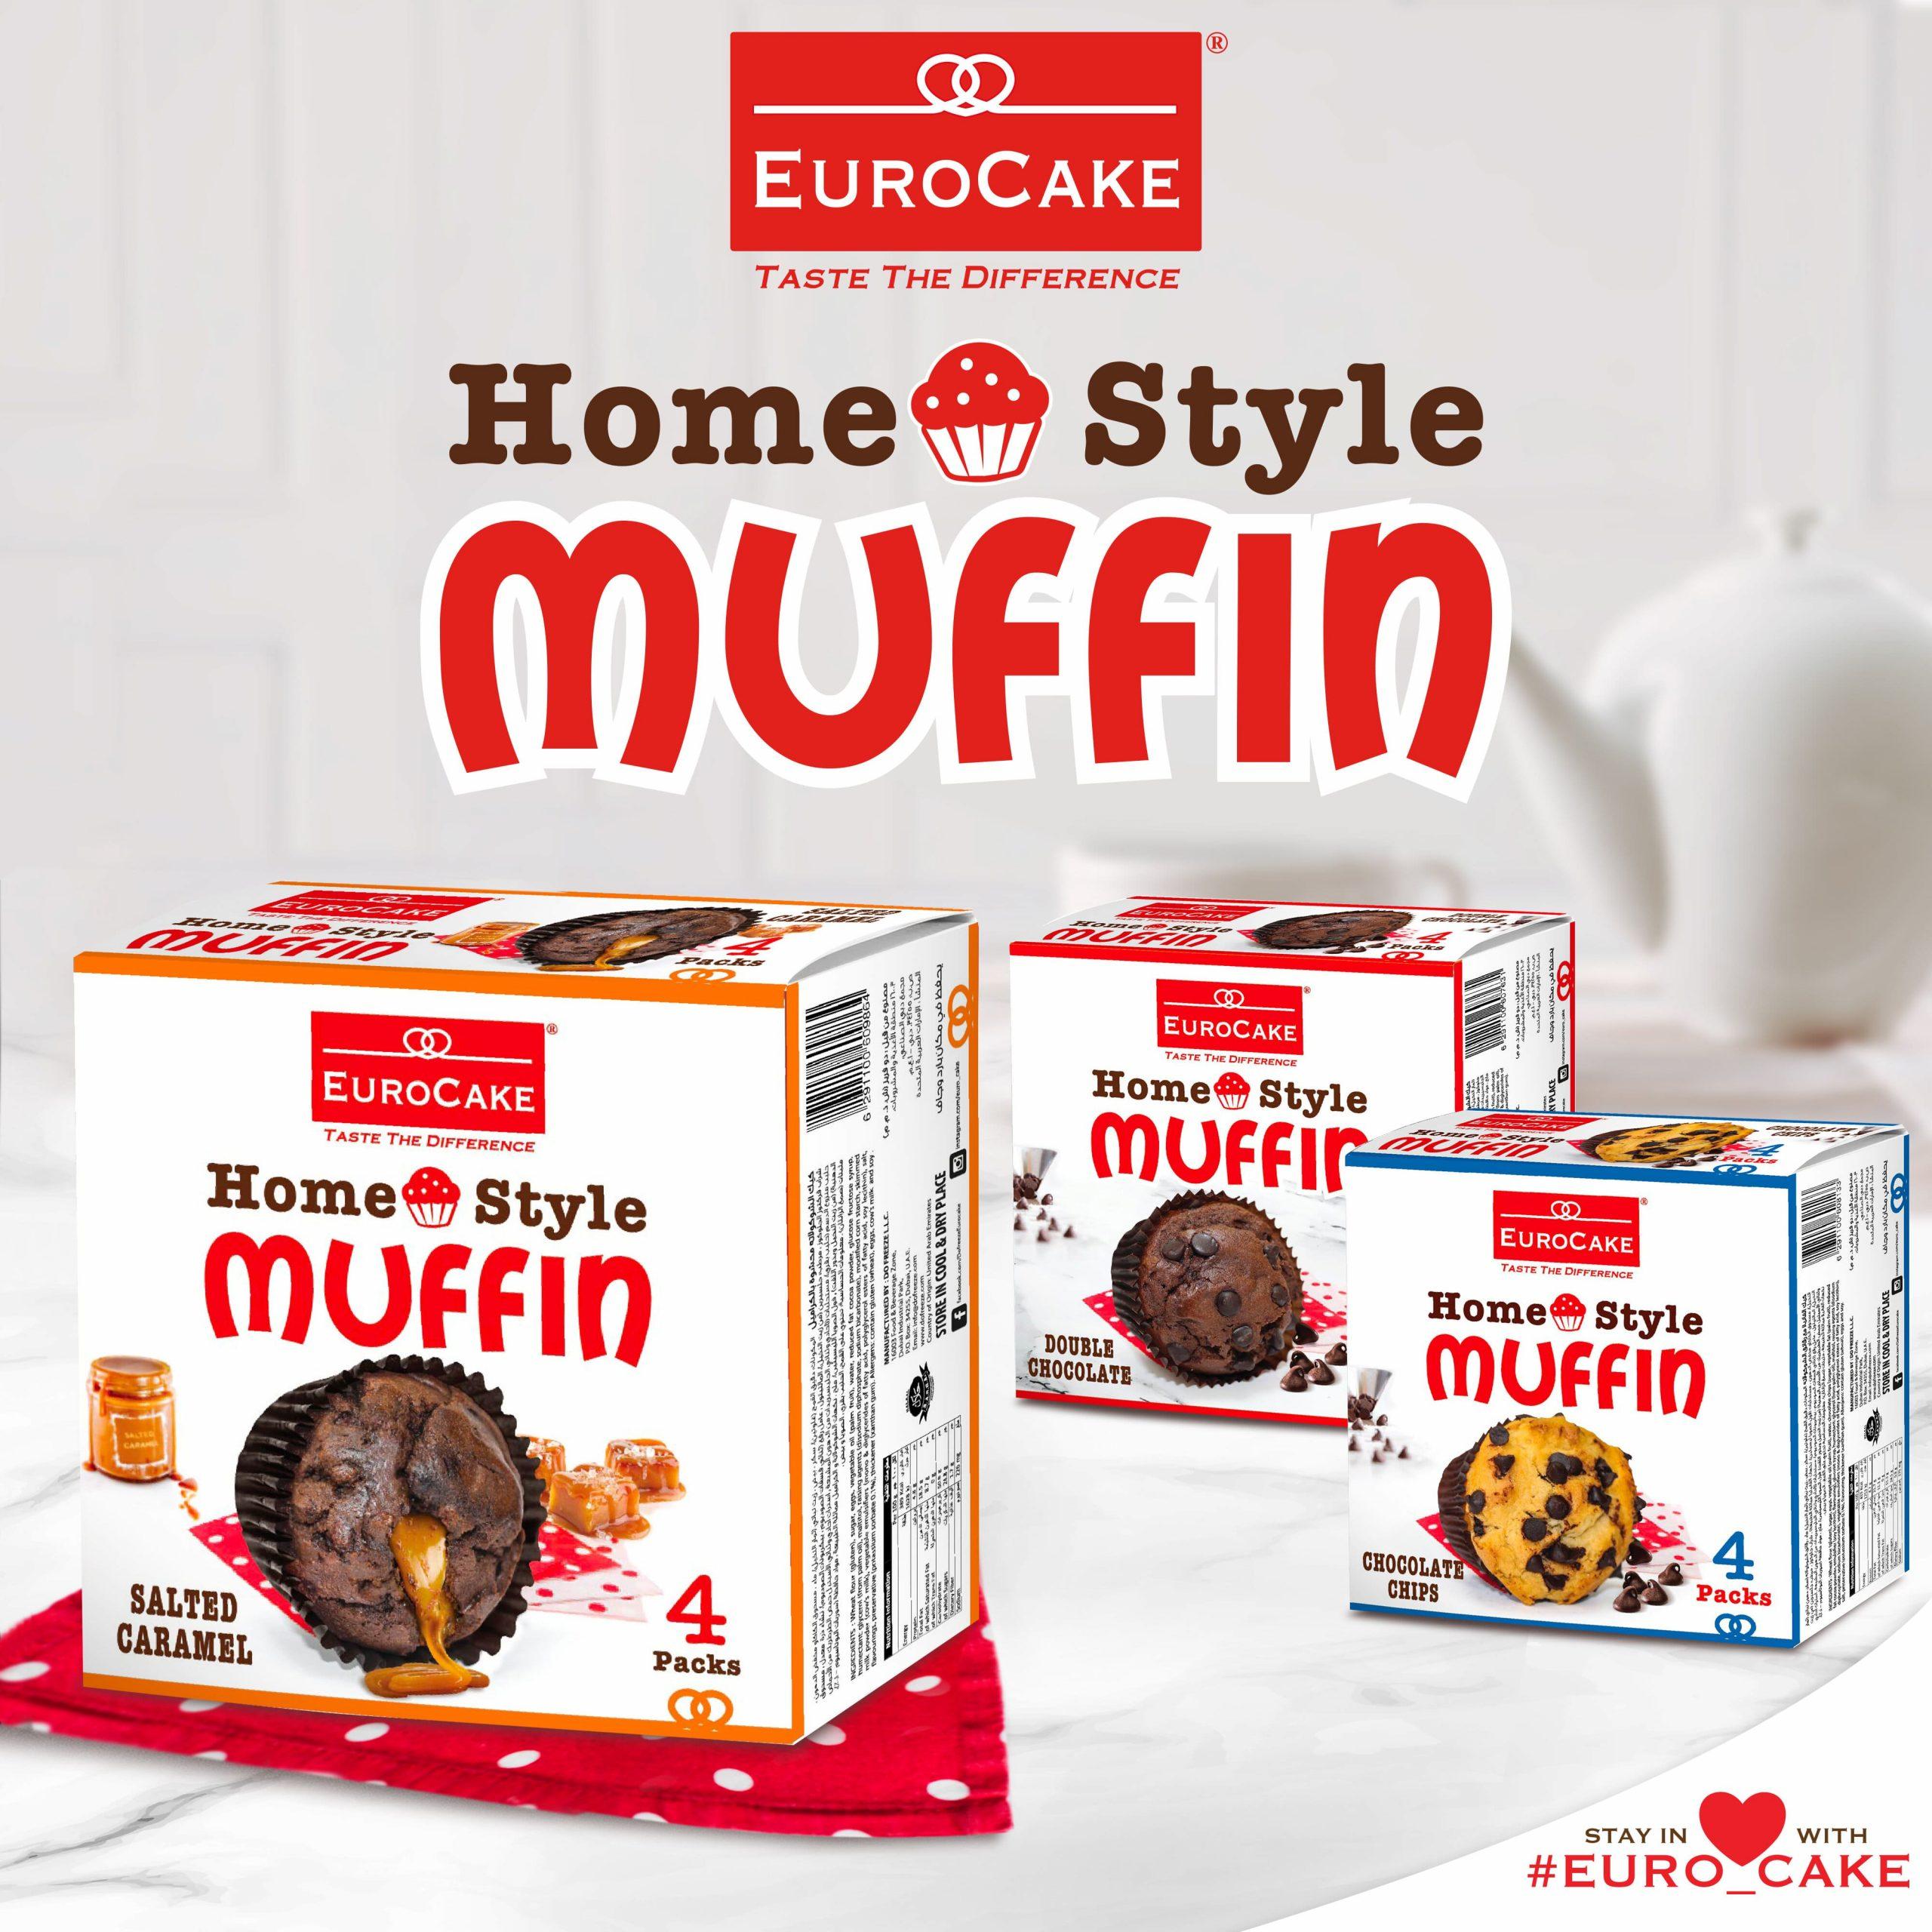 EUROCAKE Homestyle Muffin 4pc - PR